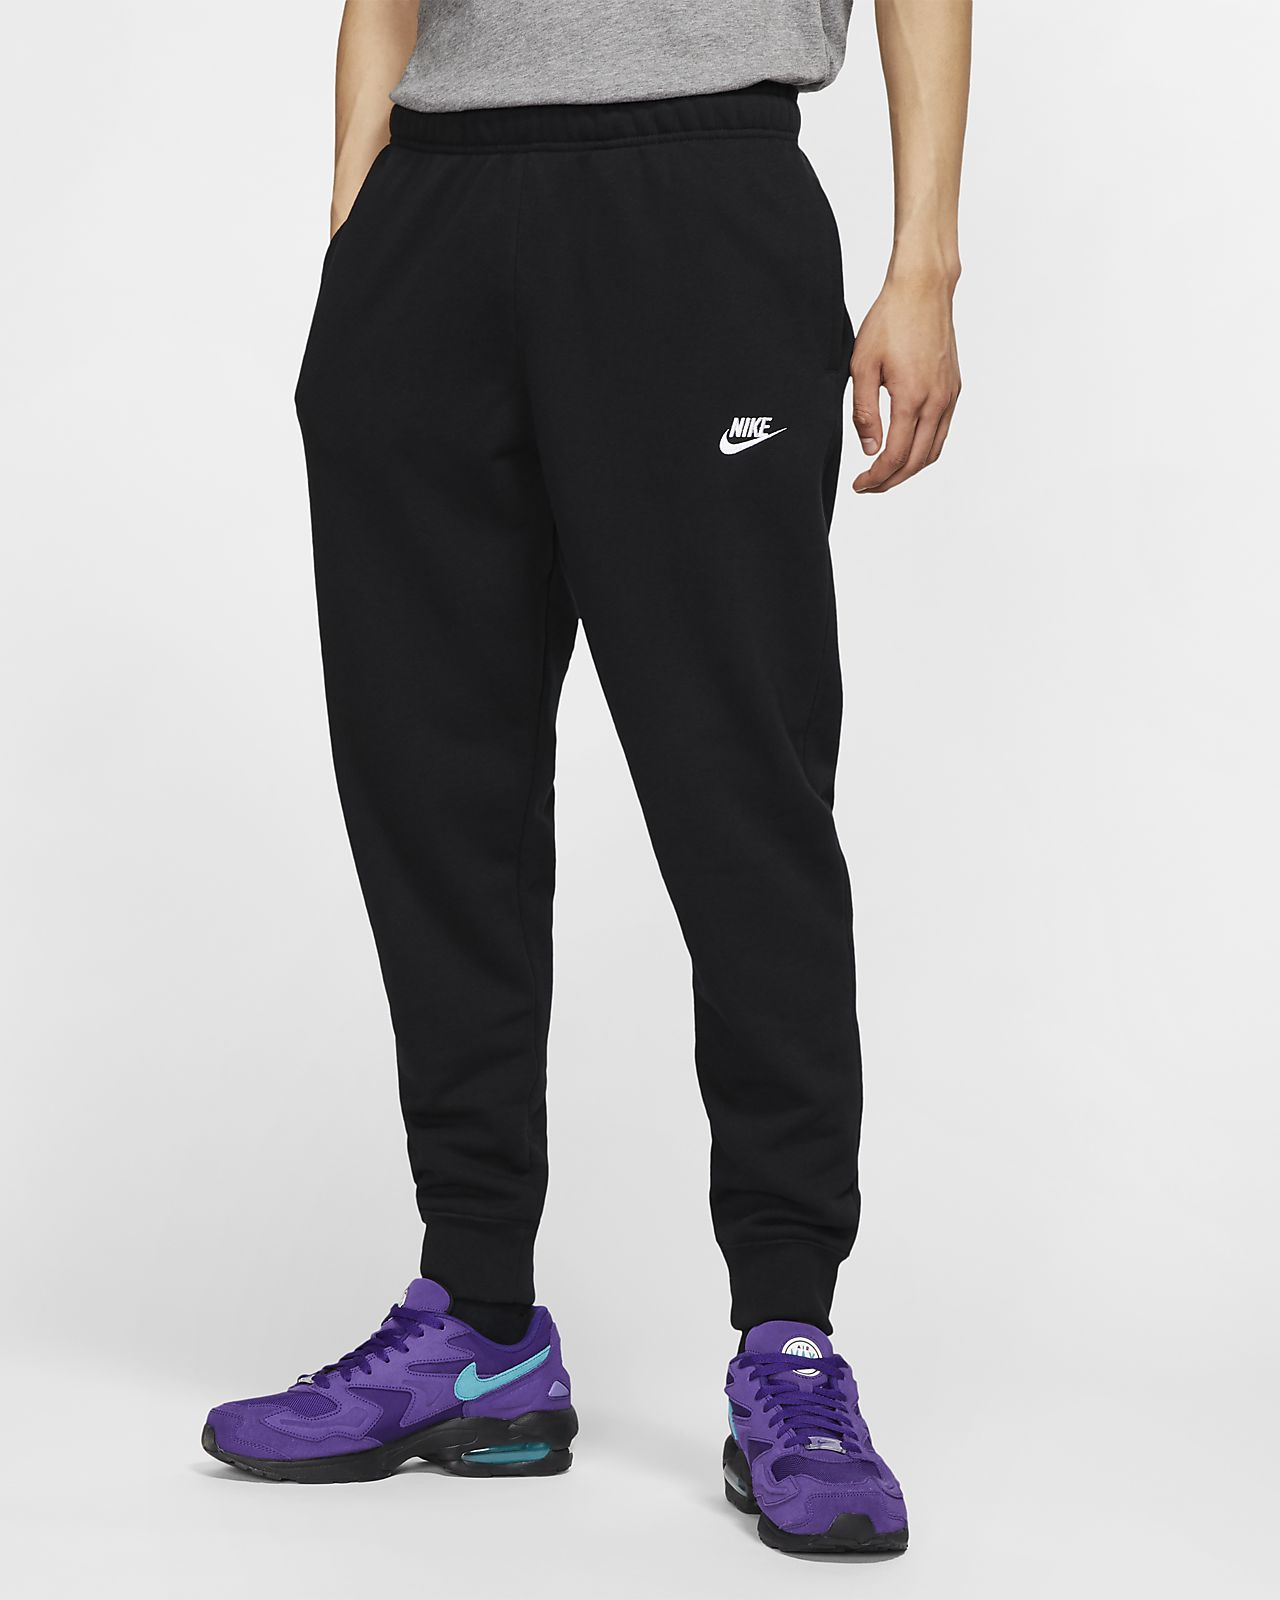 Pantaloni jogger in French Terry Nike Sportswear Club Uomo